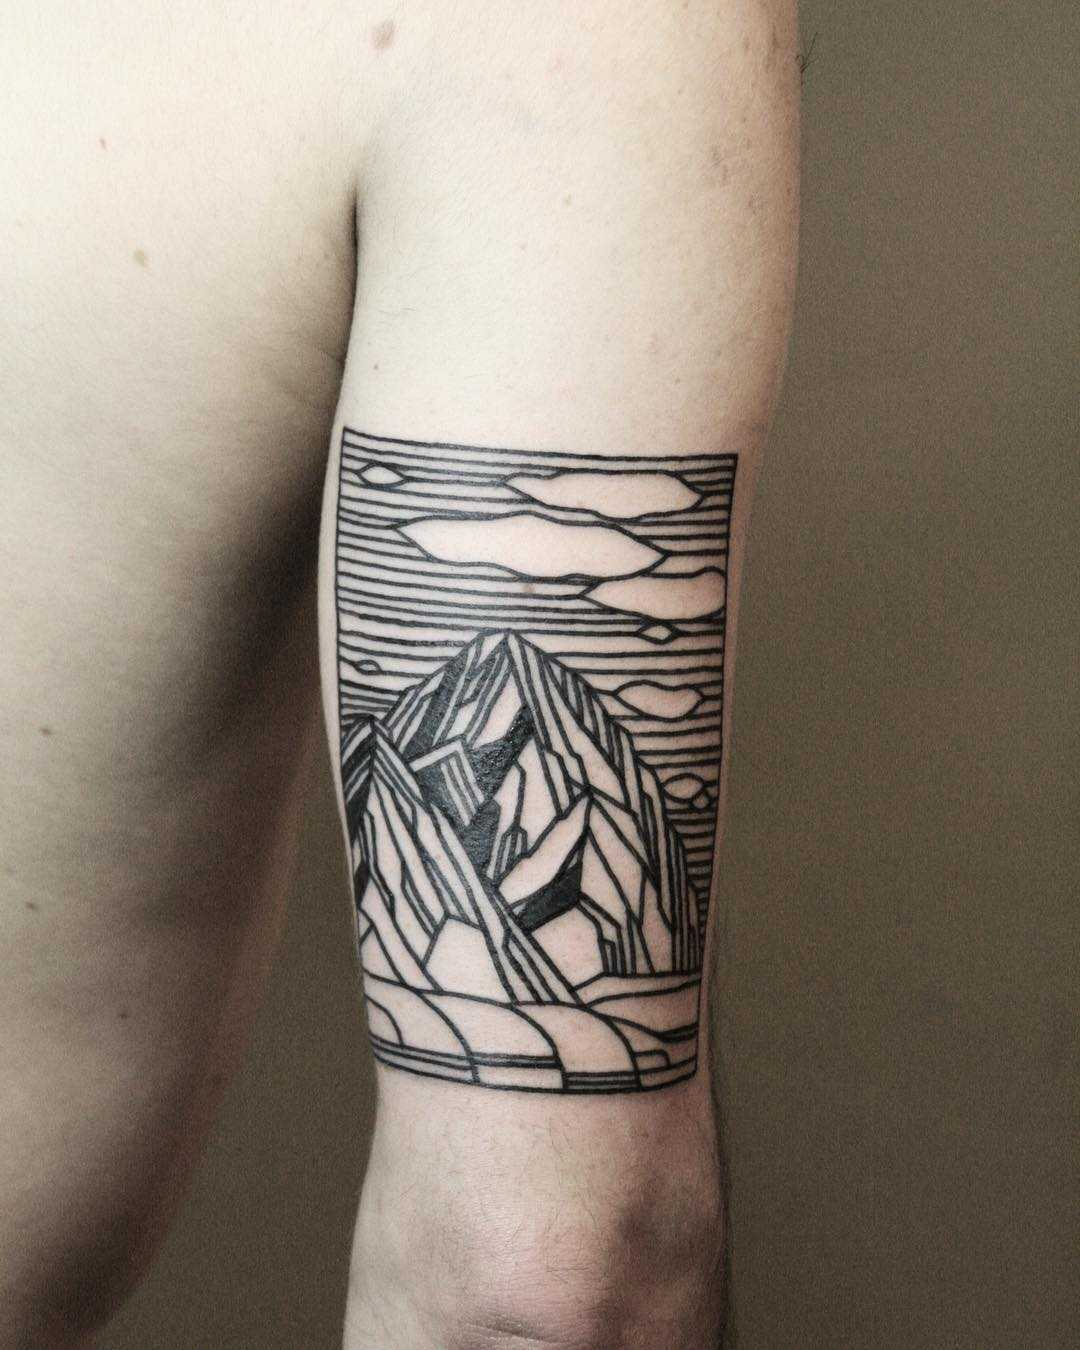 Bold mountains by tattooist Spence @zz tattoo